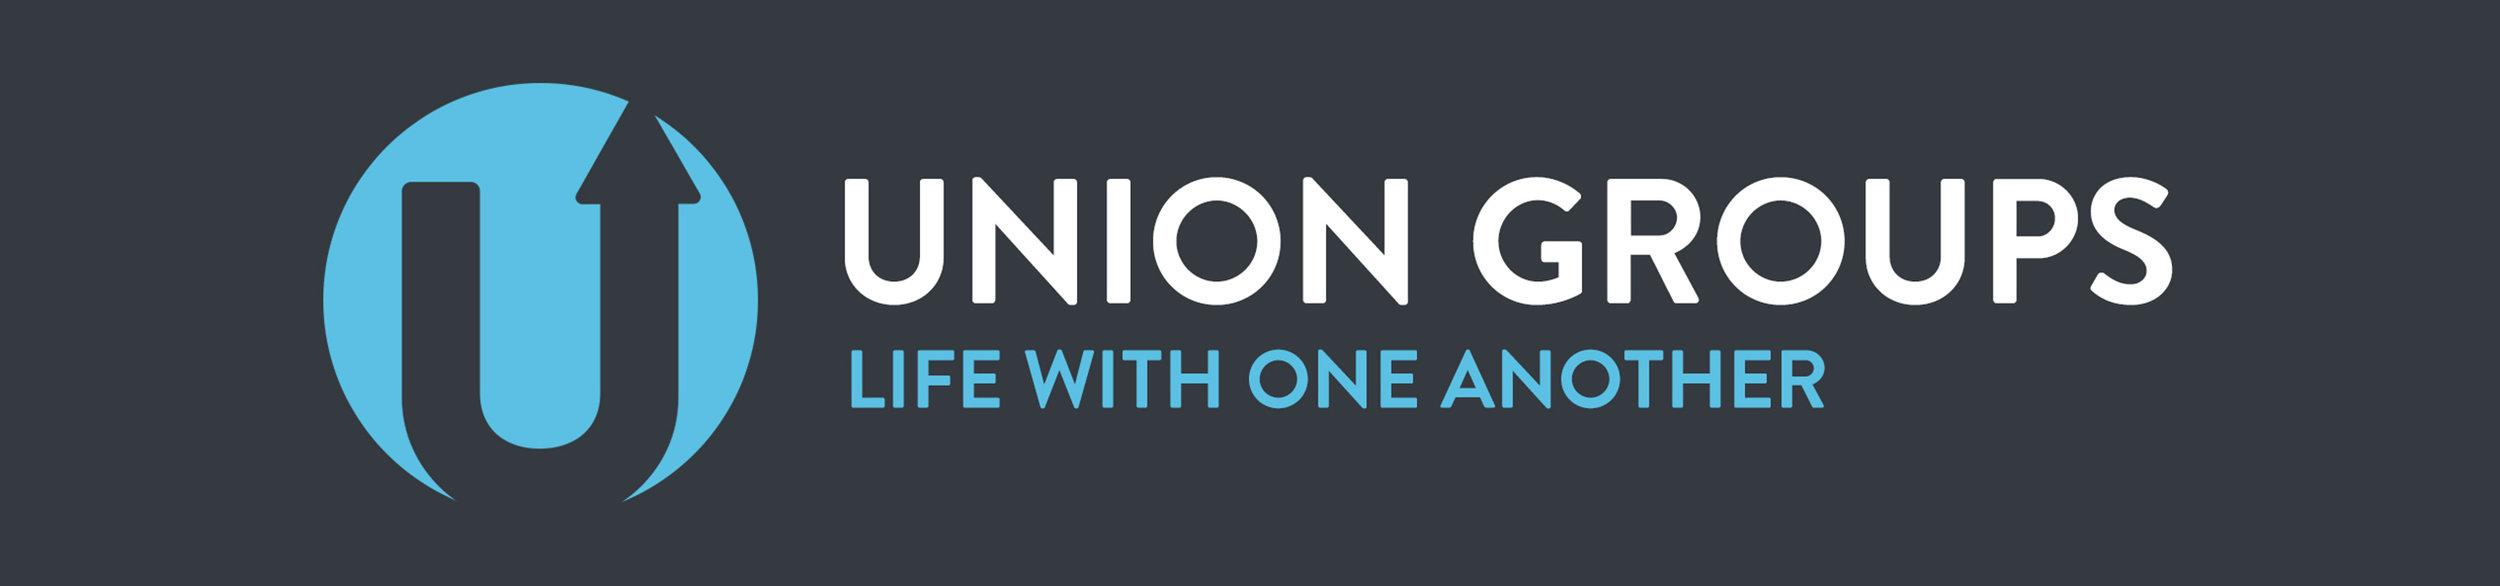 Union Group Header.jpg